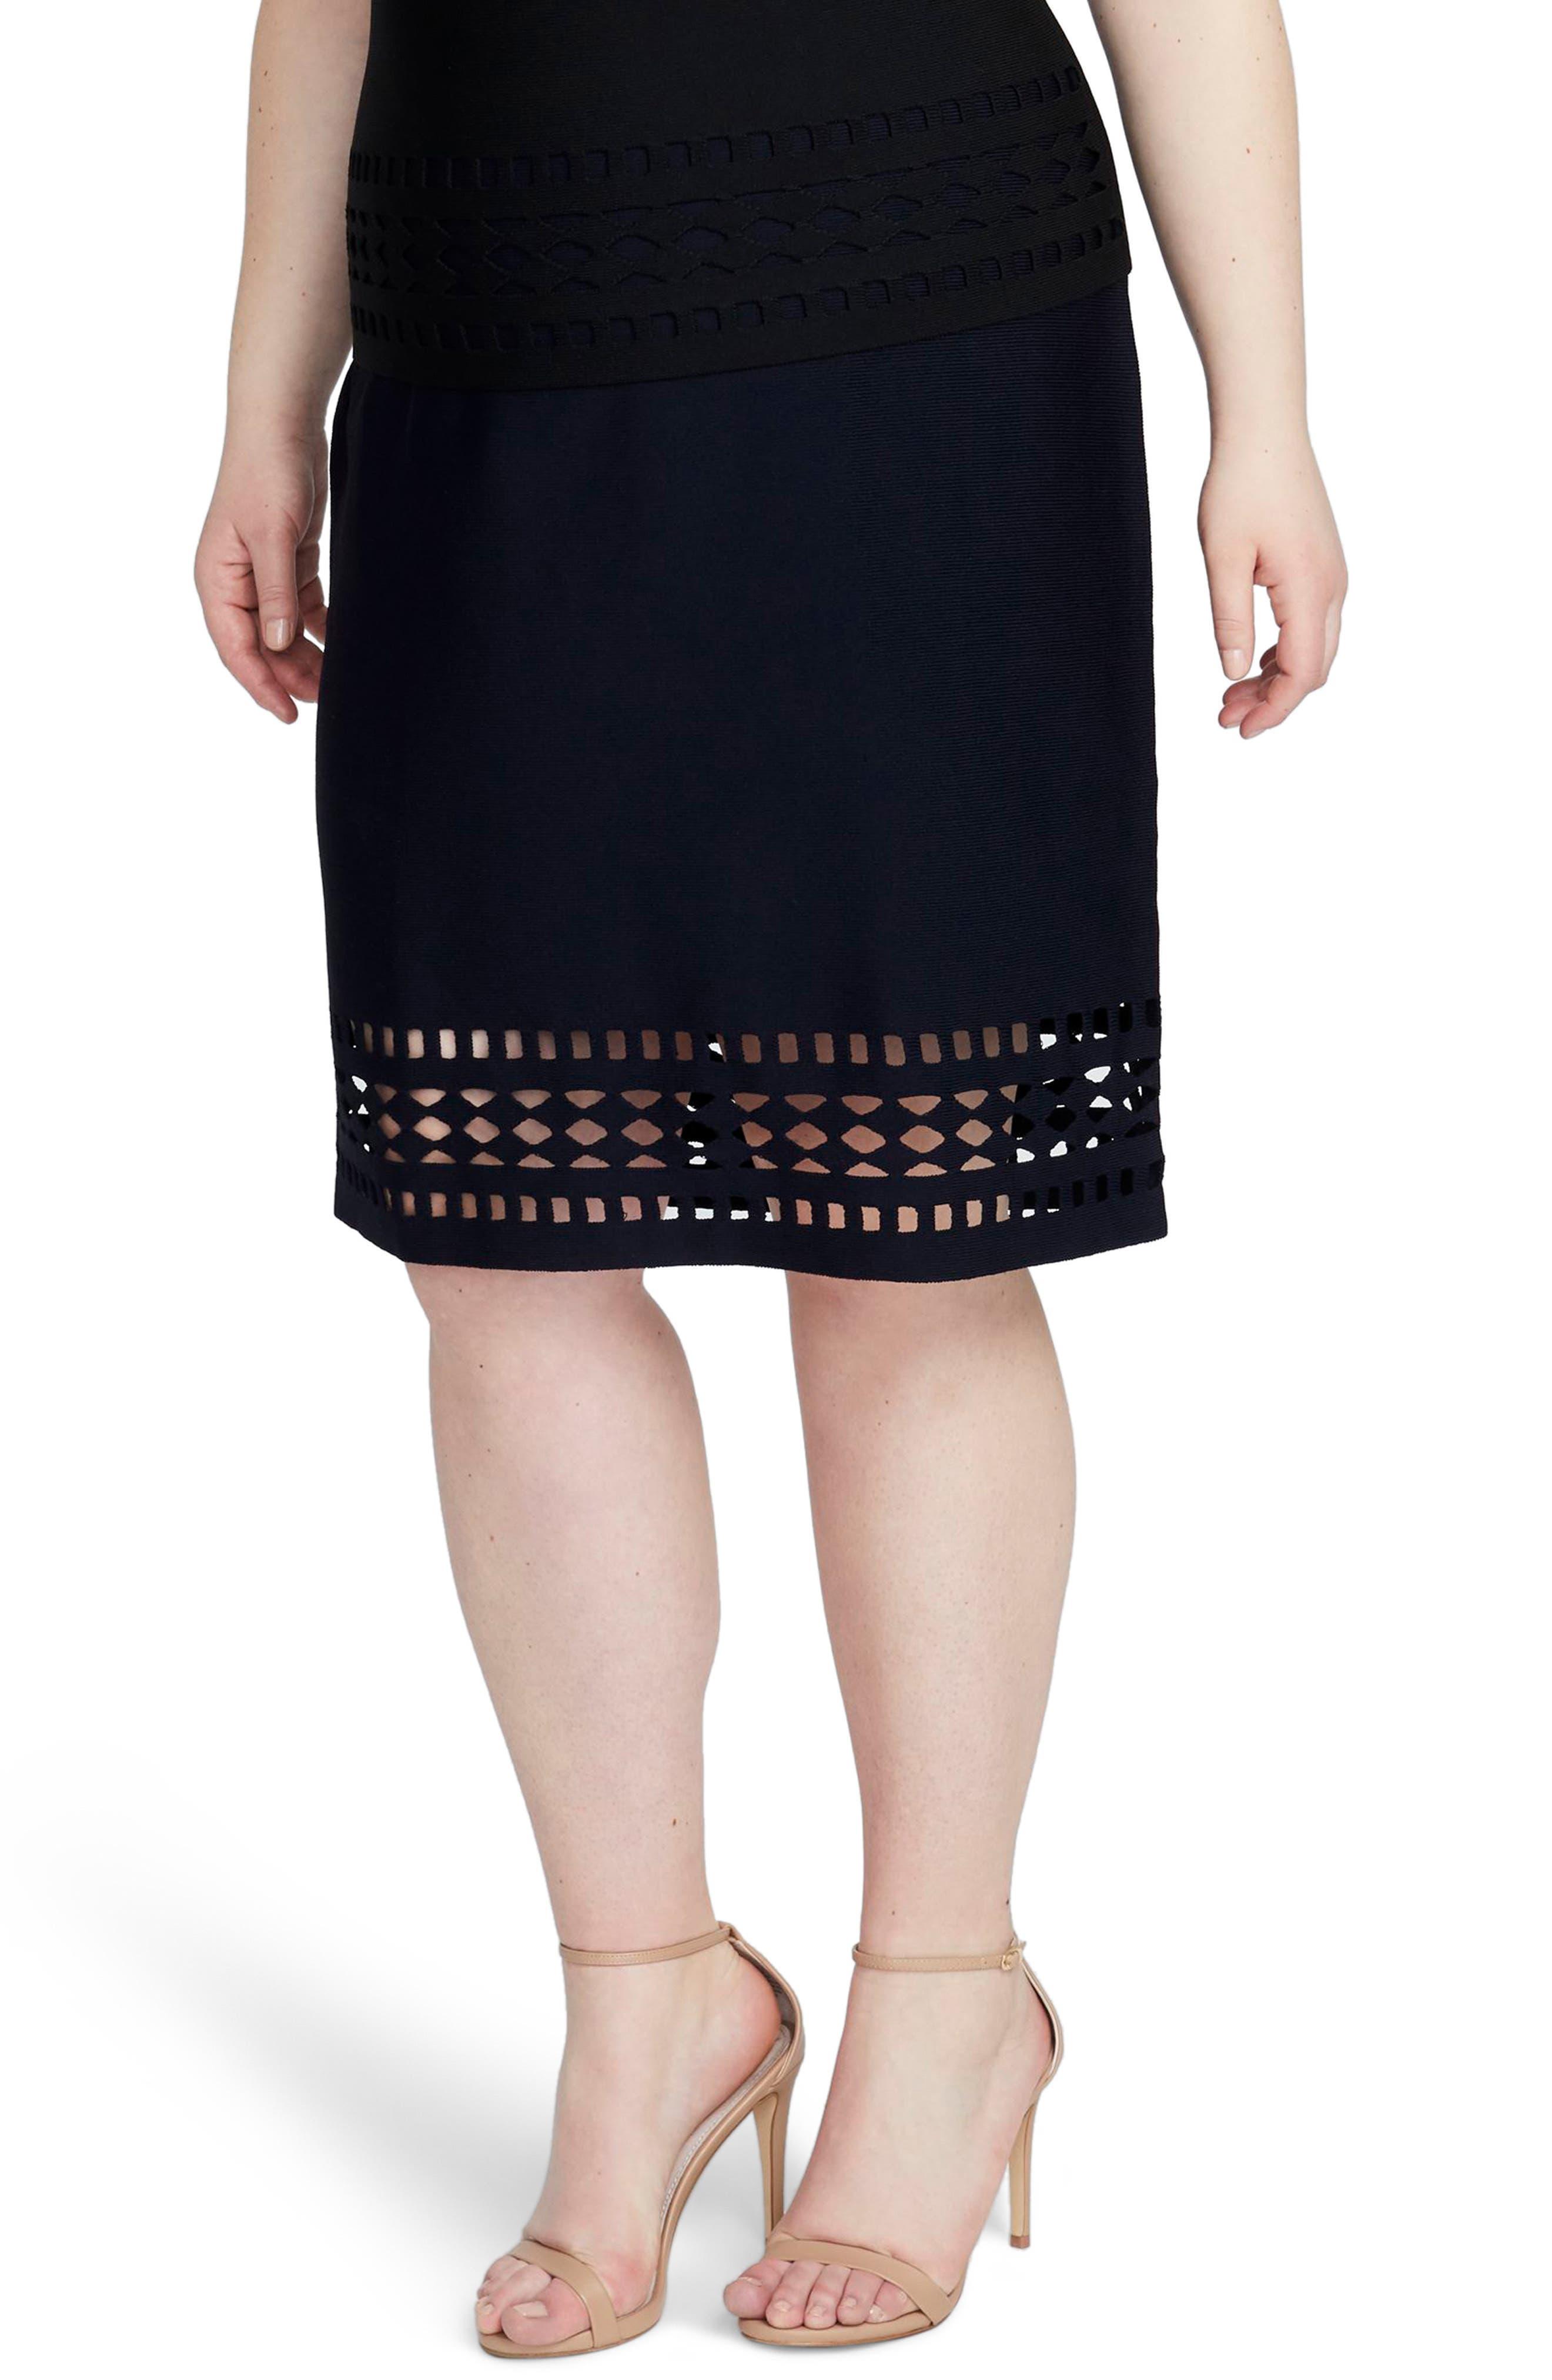 RACHEL RACHEL ROY Cutout Knit Skirt, Main, color, 001